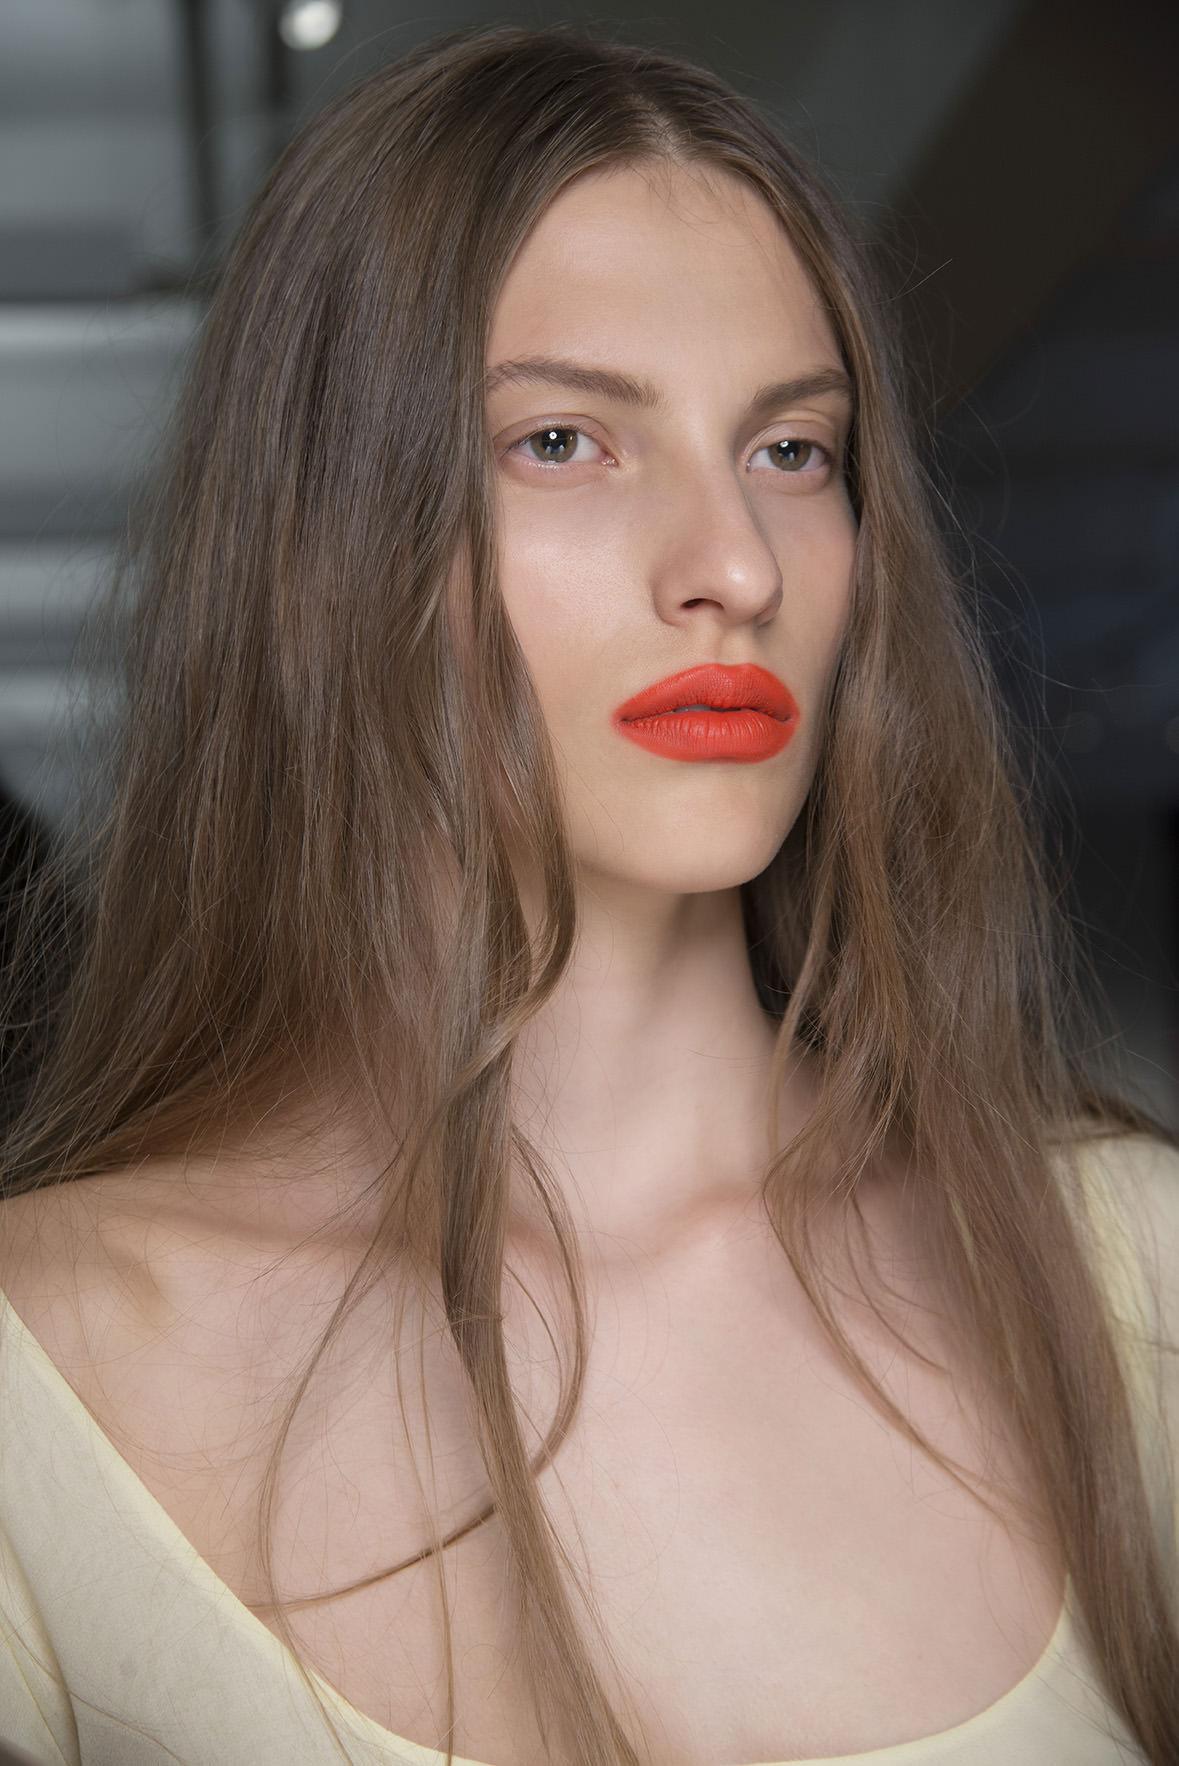 BlogStar: Wiosenne trendy makijażu w MAC - BlogStar.pl